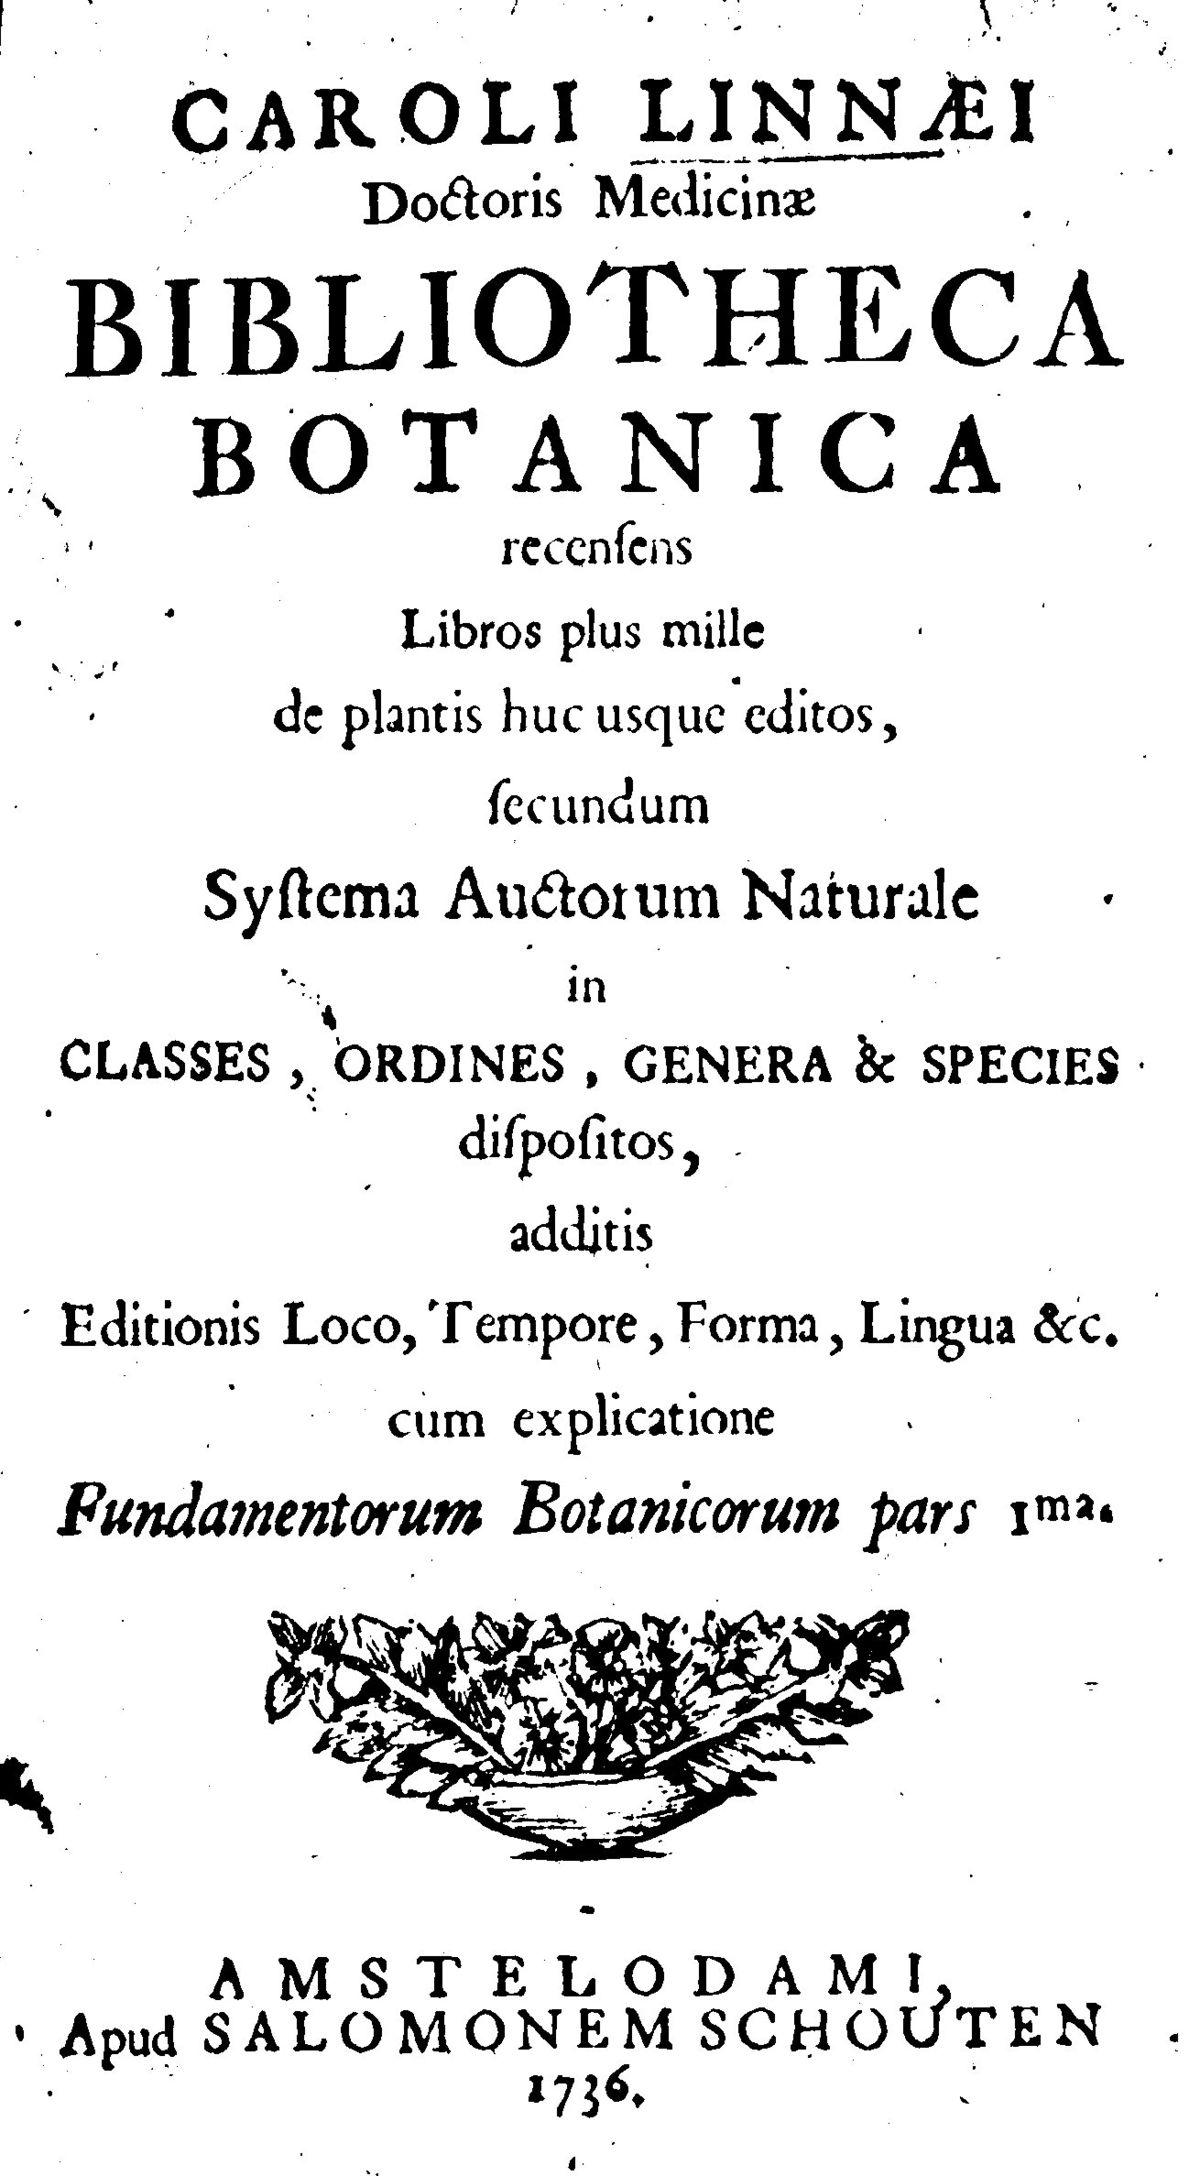 Bibliotheca Botanica - Wikipedia